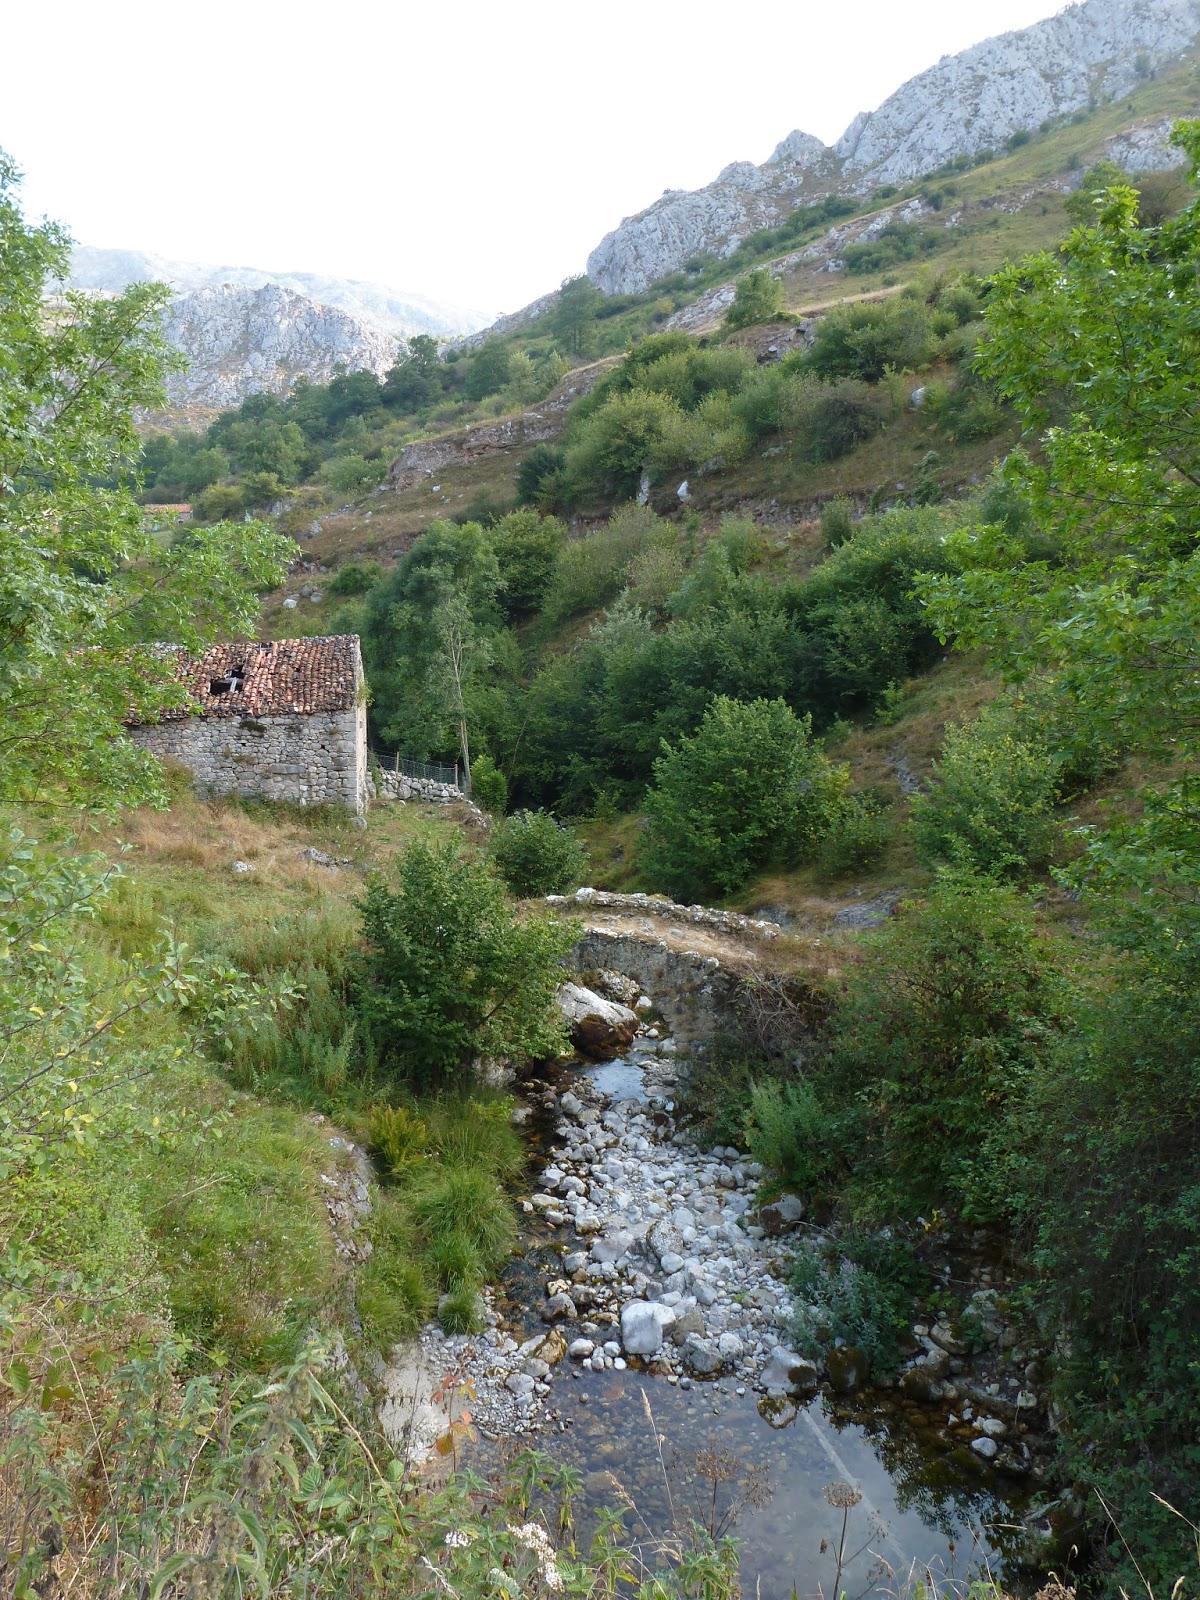 Bridge in abandoned village